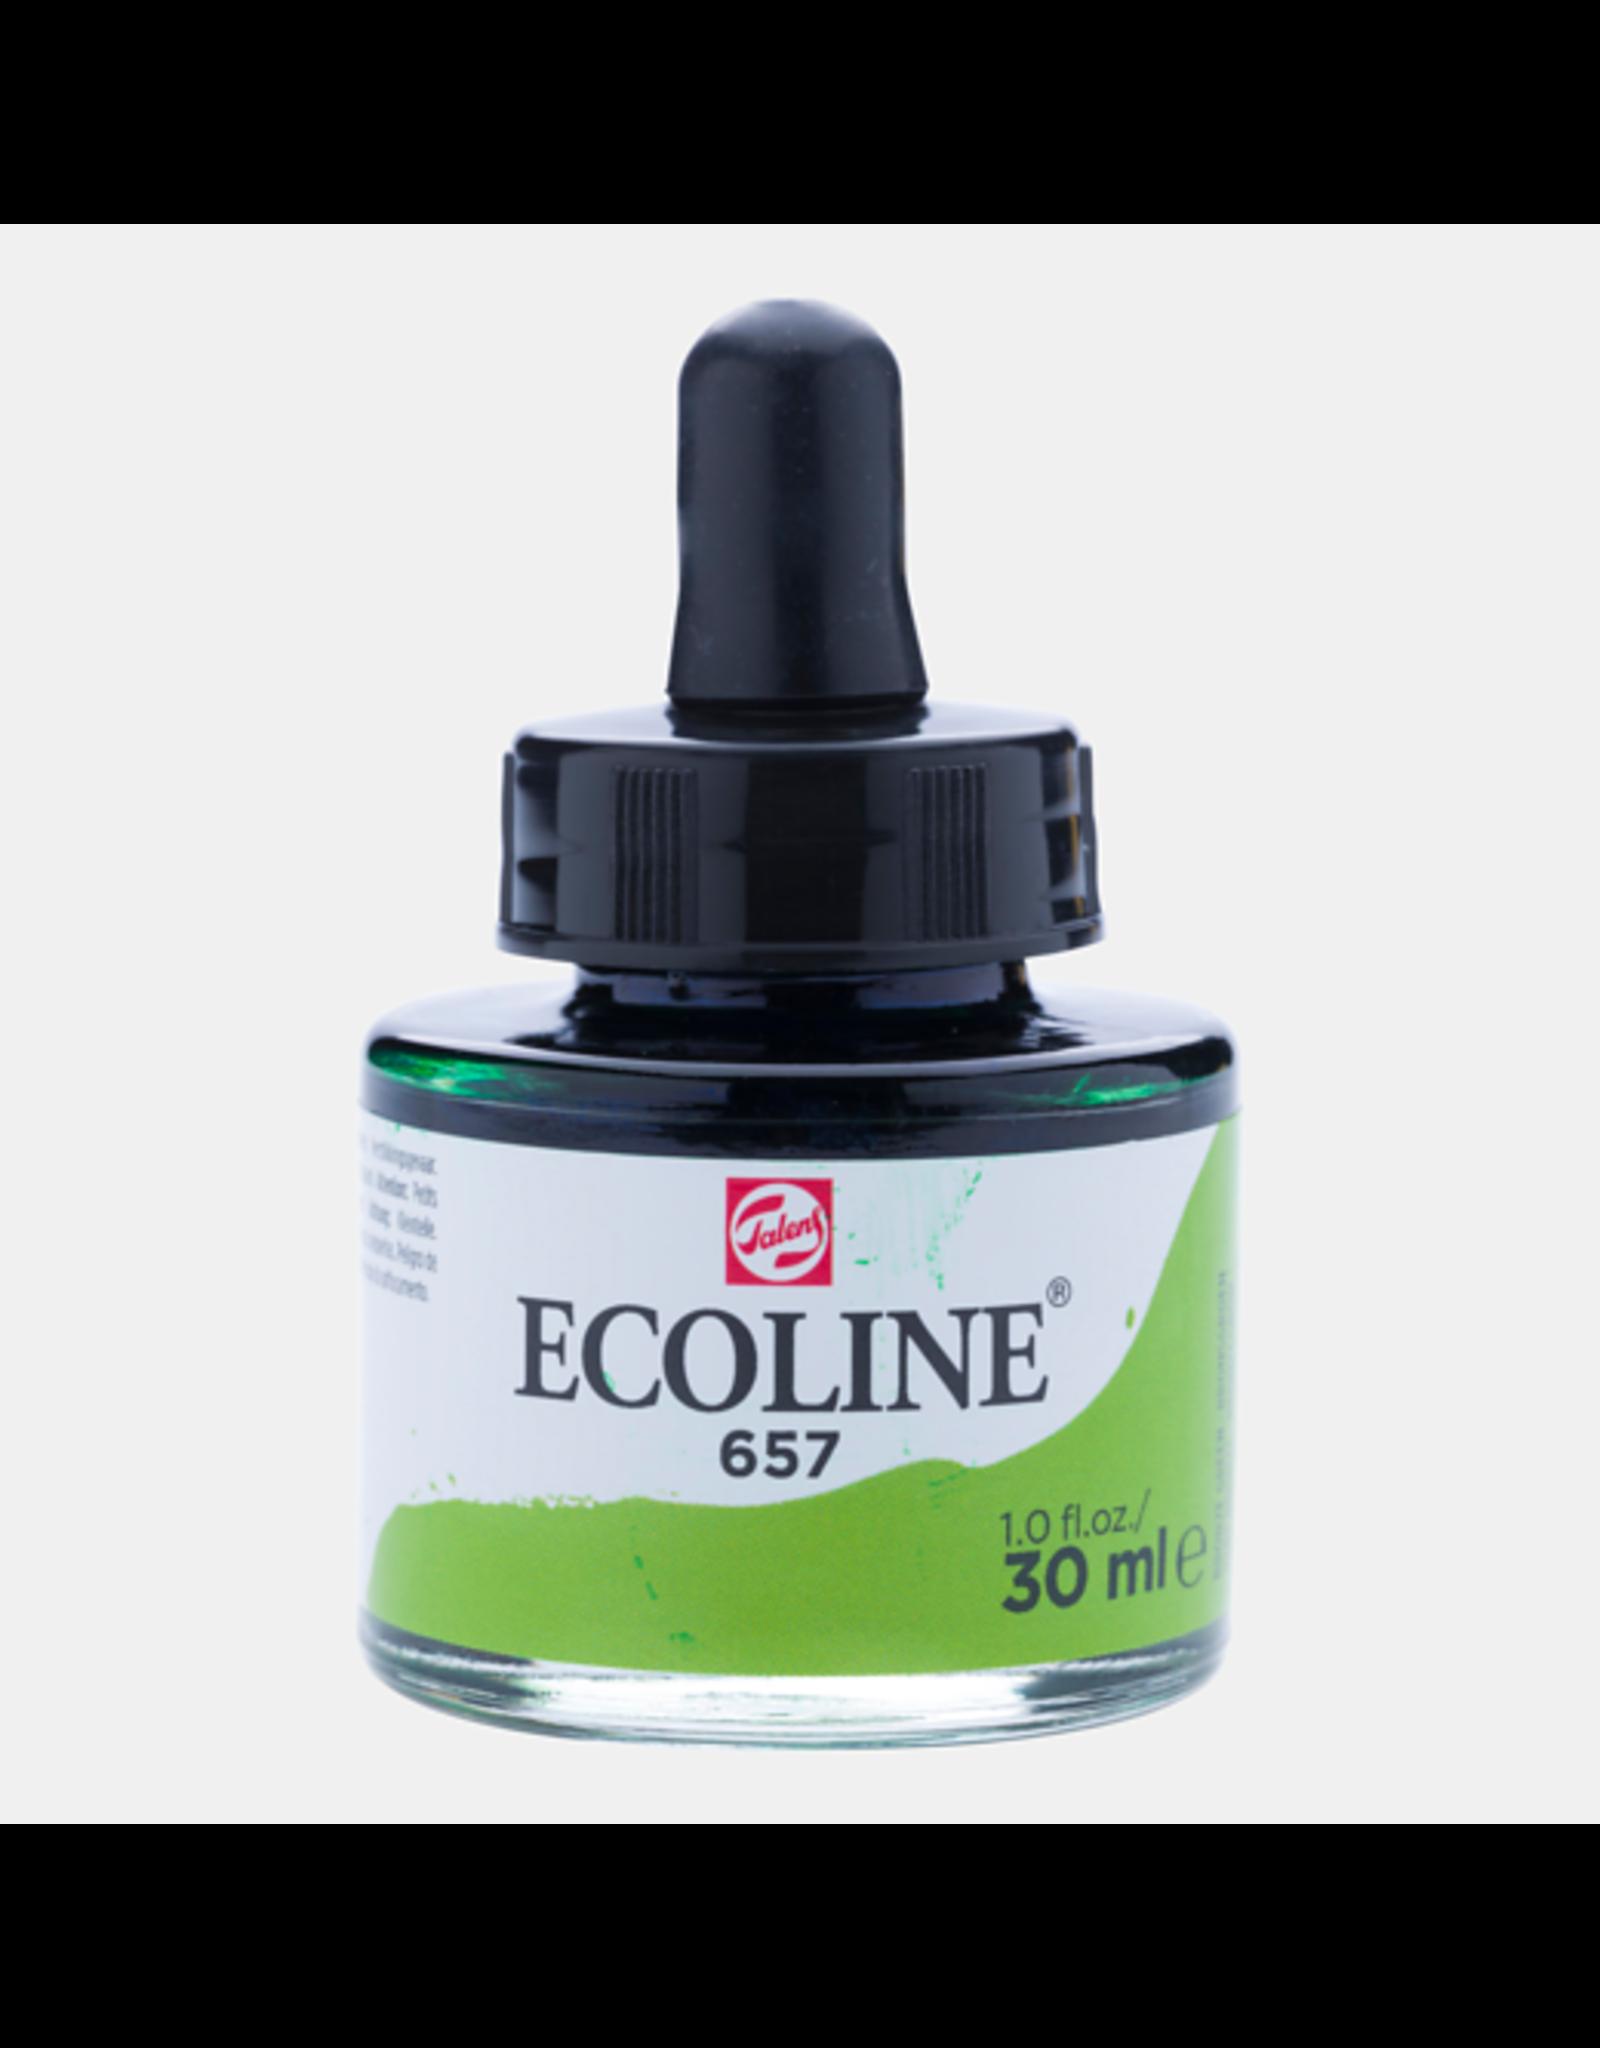 Talens Ecoline 30 ML. Bronsgroen